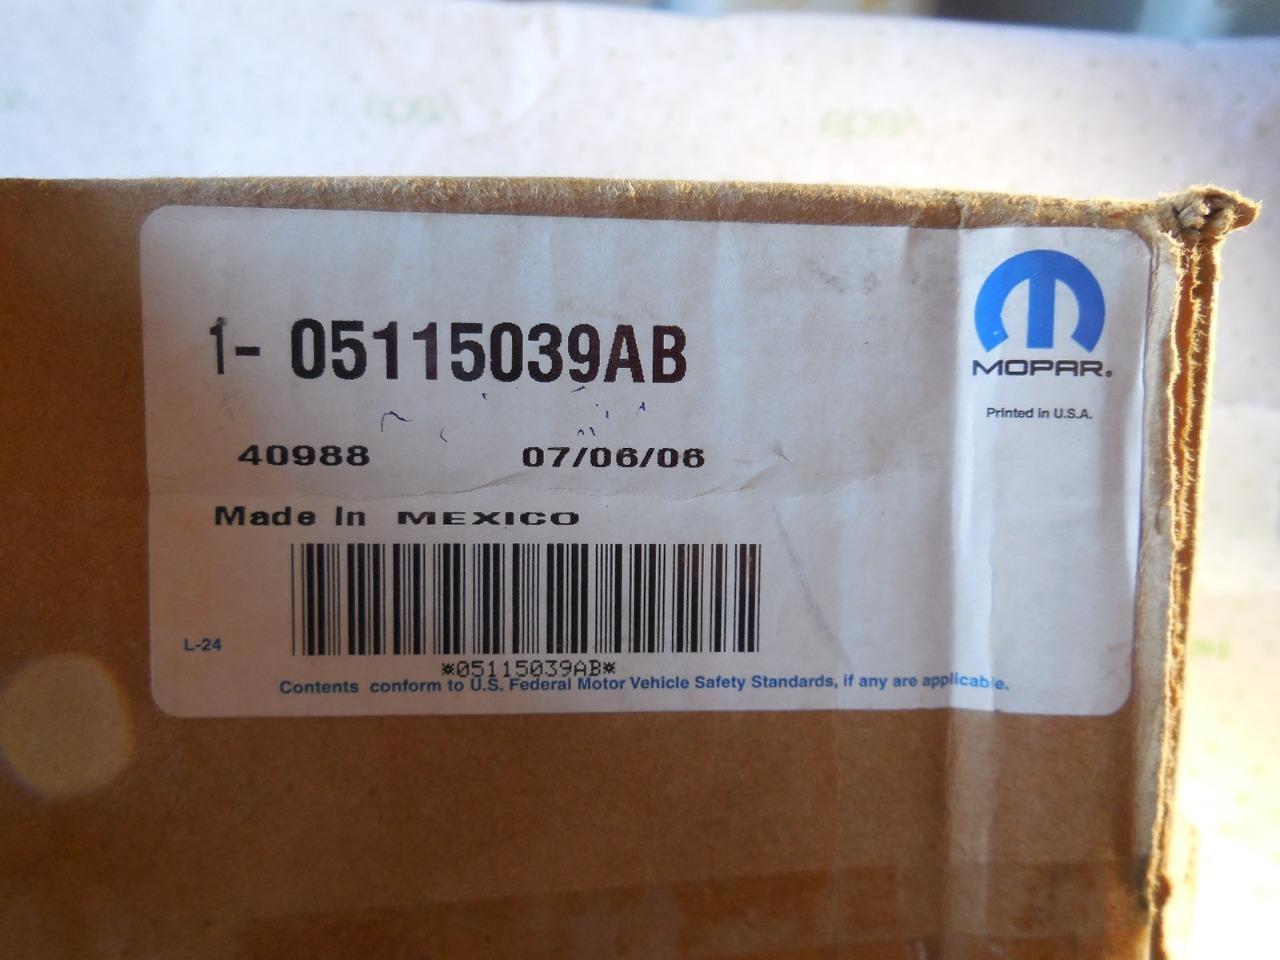 NEW OEM FACTORY MOPAR Dodge Carliber Left Outside Mirror 05115039AA SHIPS TODAY - $73.73